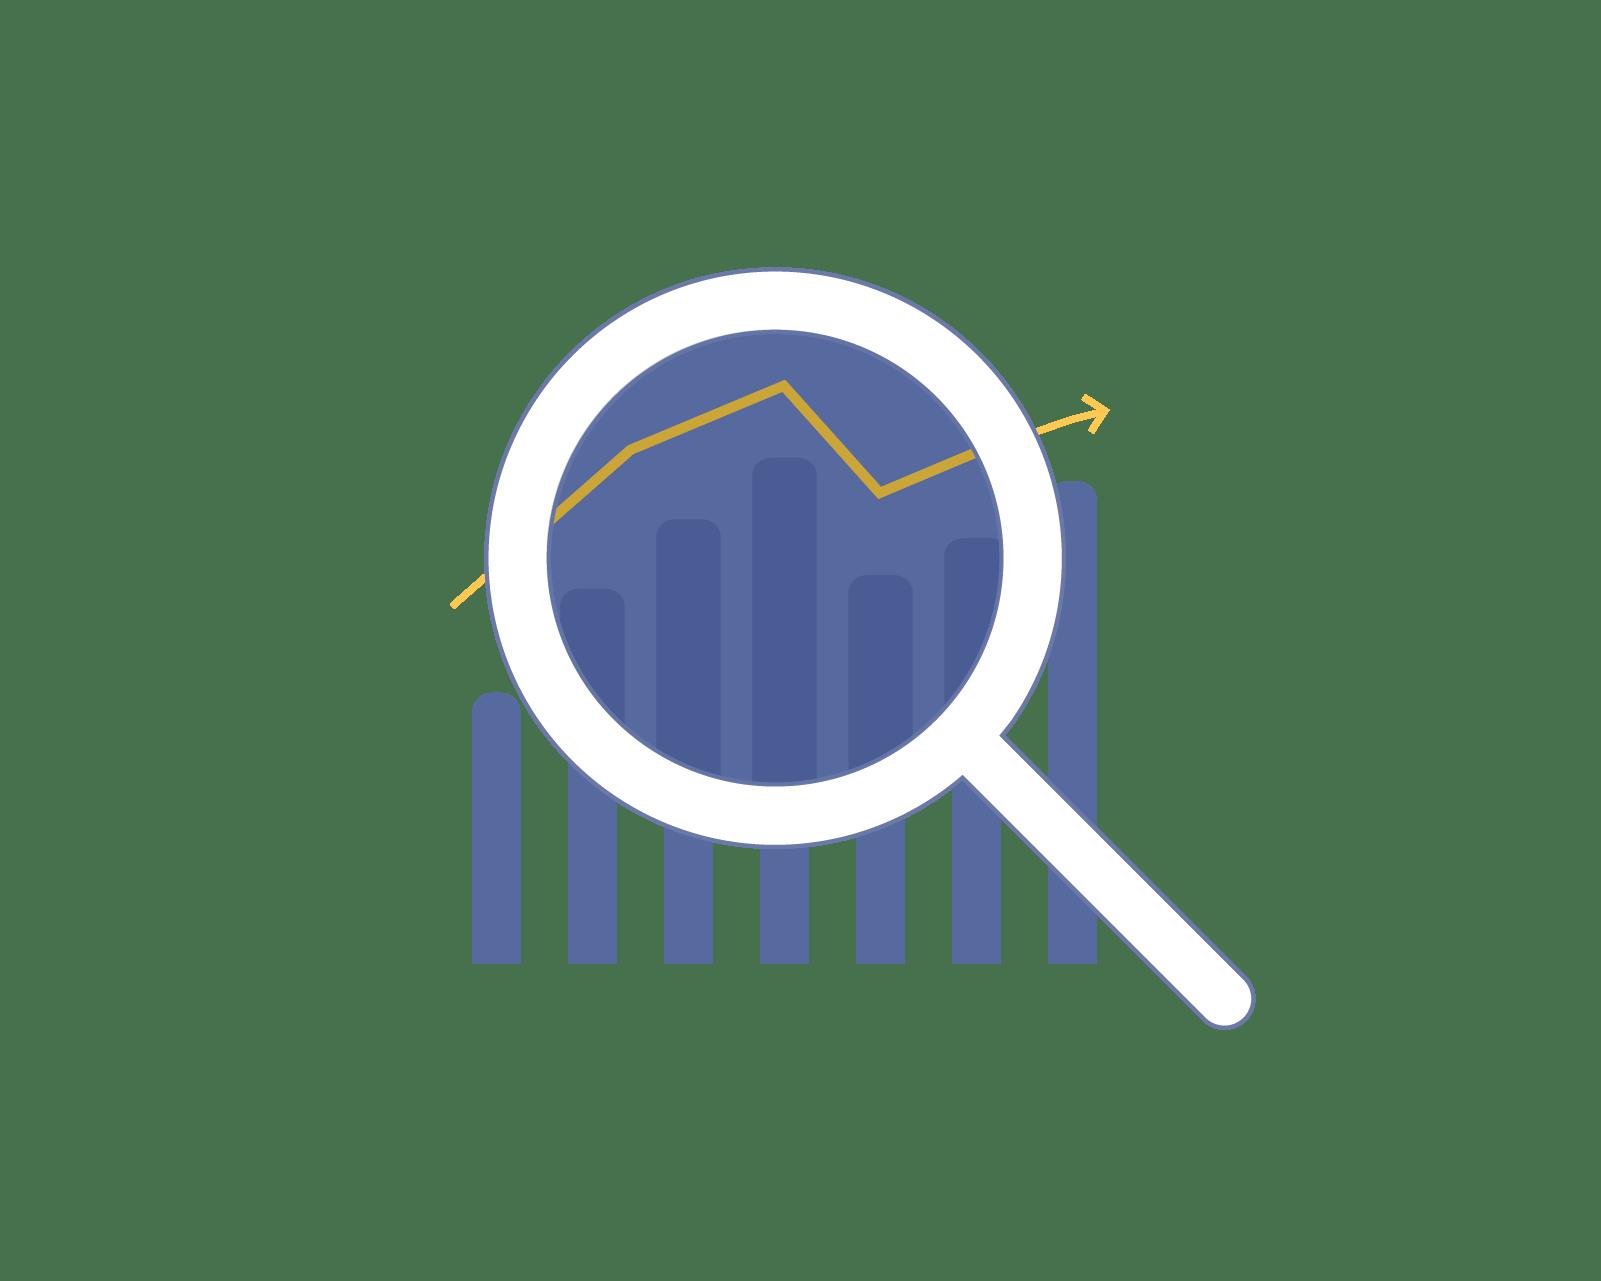 Competitive Gap Analysis | Outspoken Media